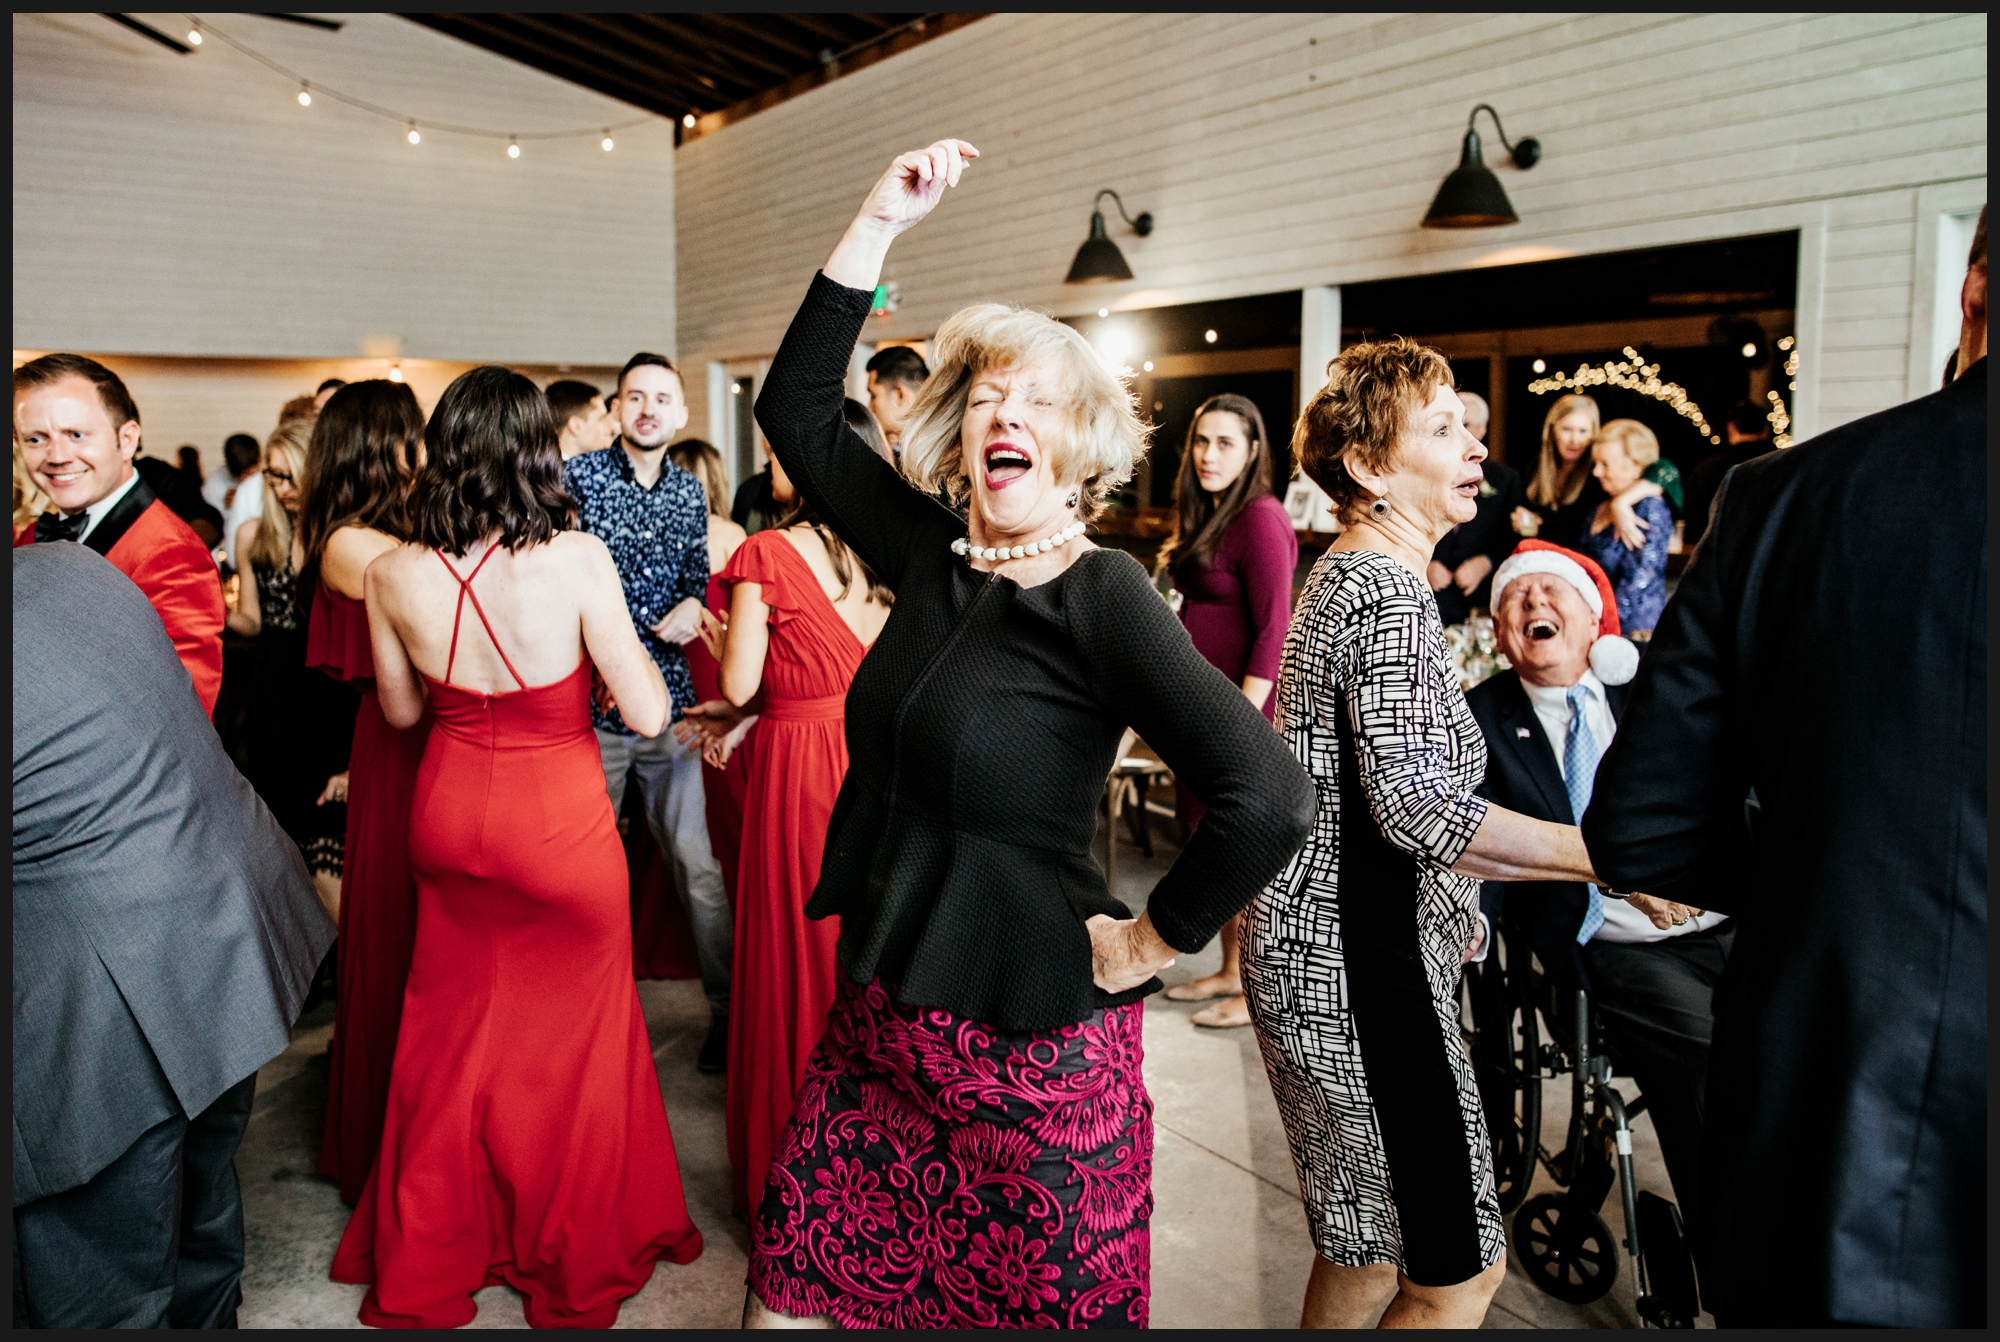 Orlando-Wedding-Photographer-destination-wedding-photographer-florida-wedding-photographer-hawaii-wedding-photographer_0544.jpg